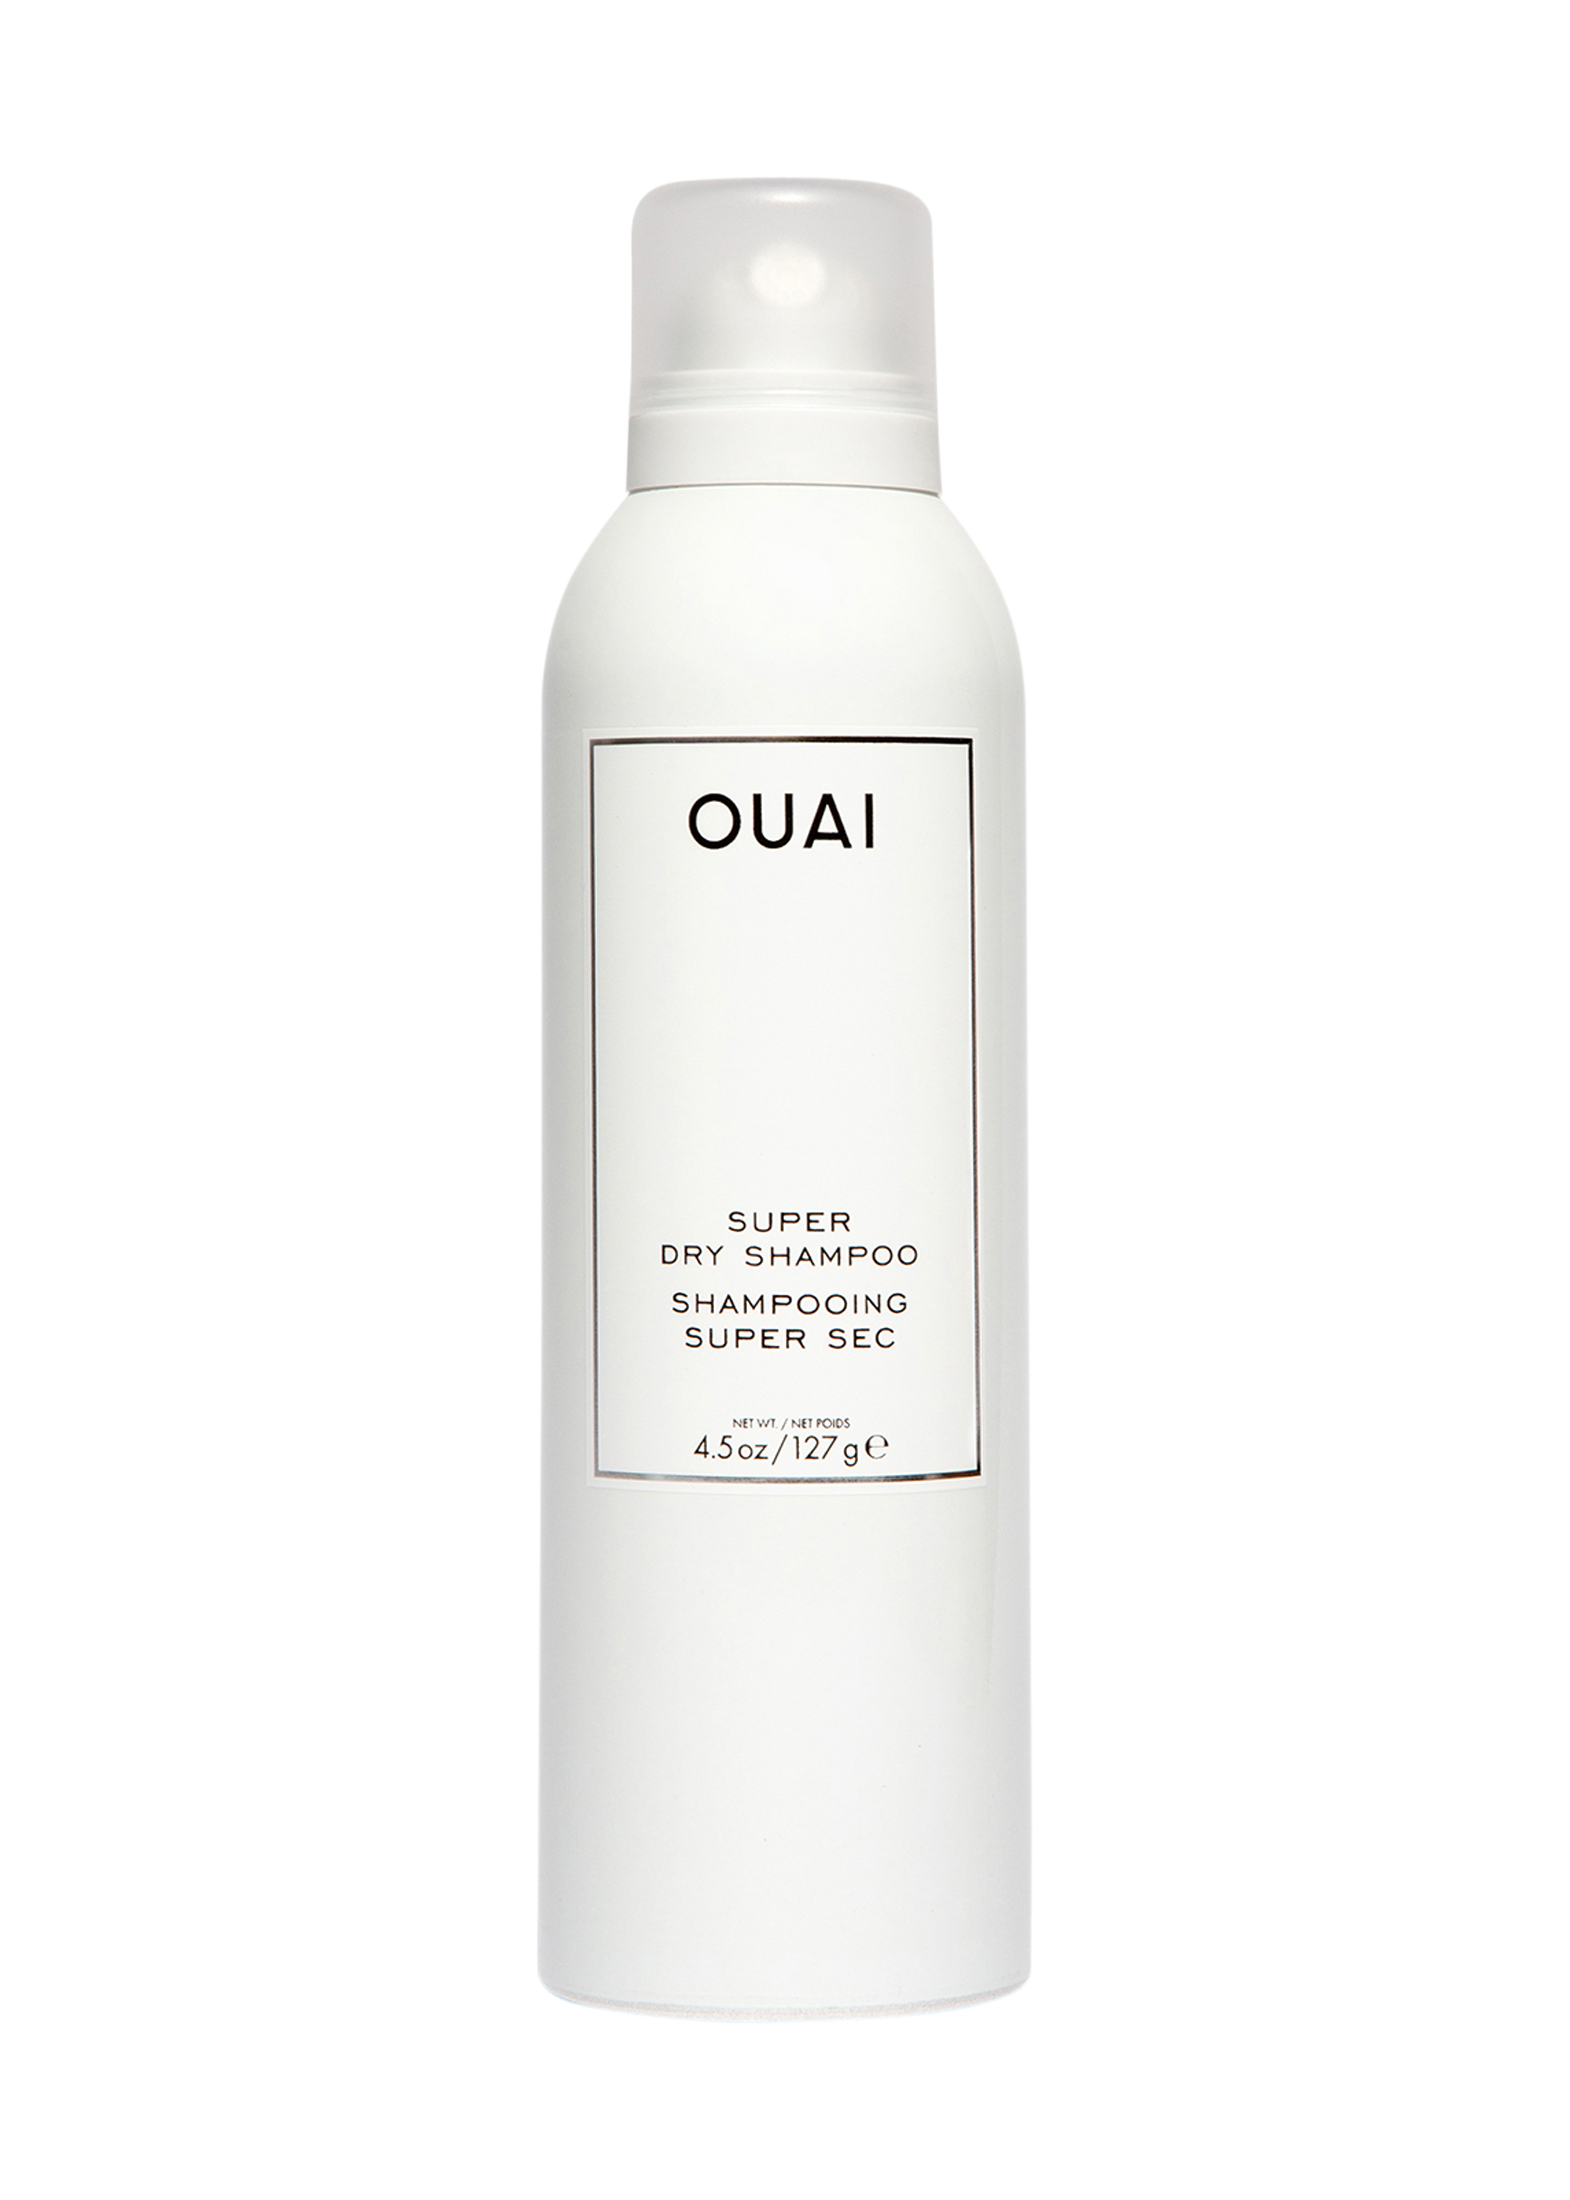 OUAI Super Dry Shampoo 127g image number 0